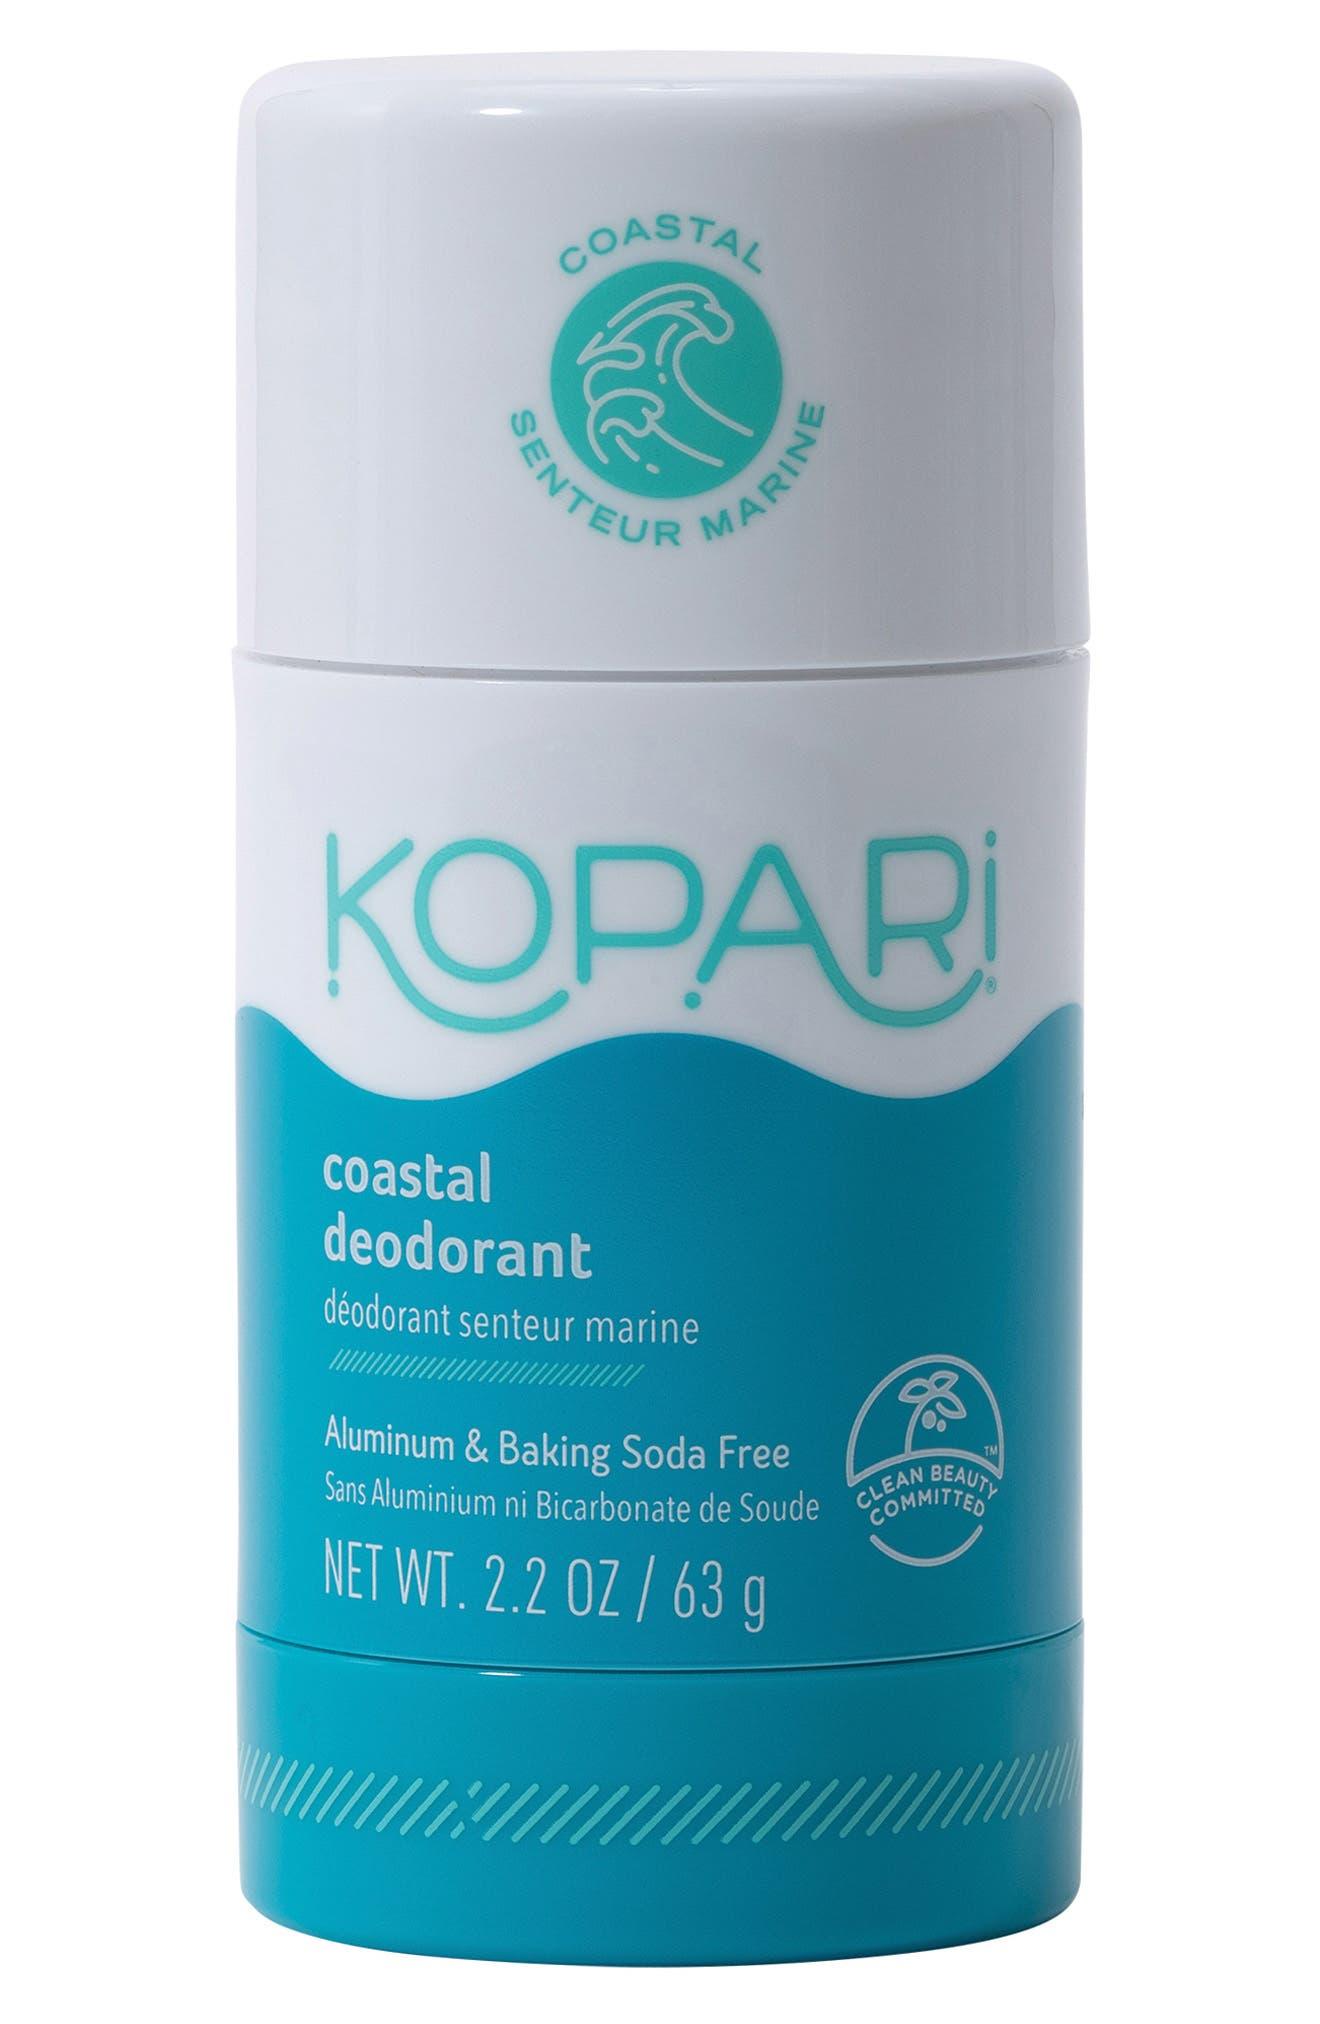 Coastal Deodorant